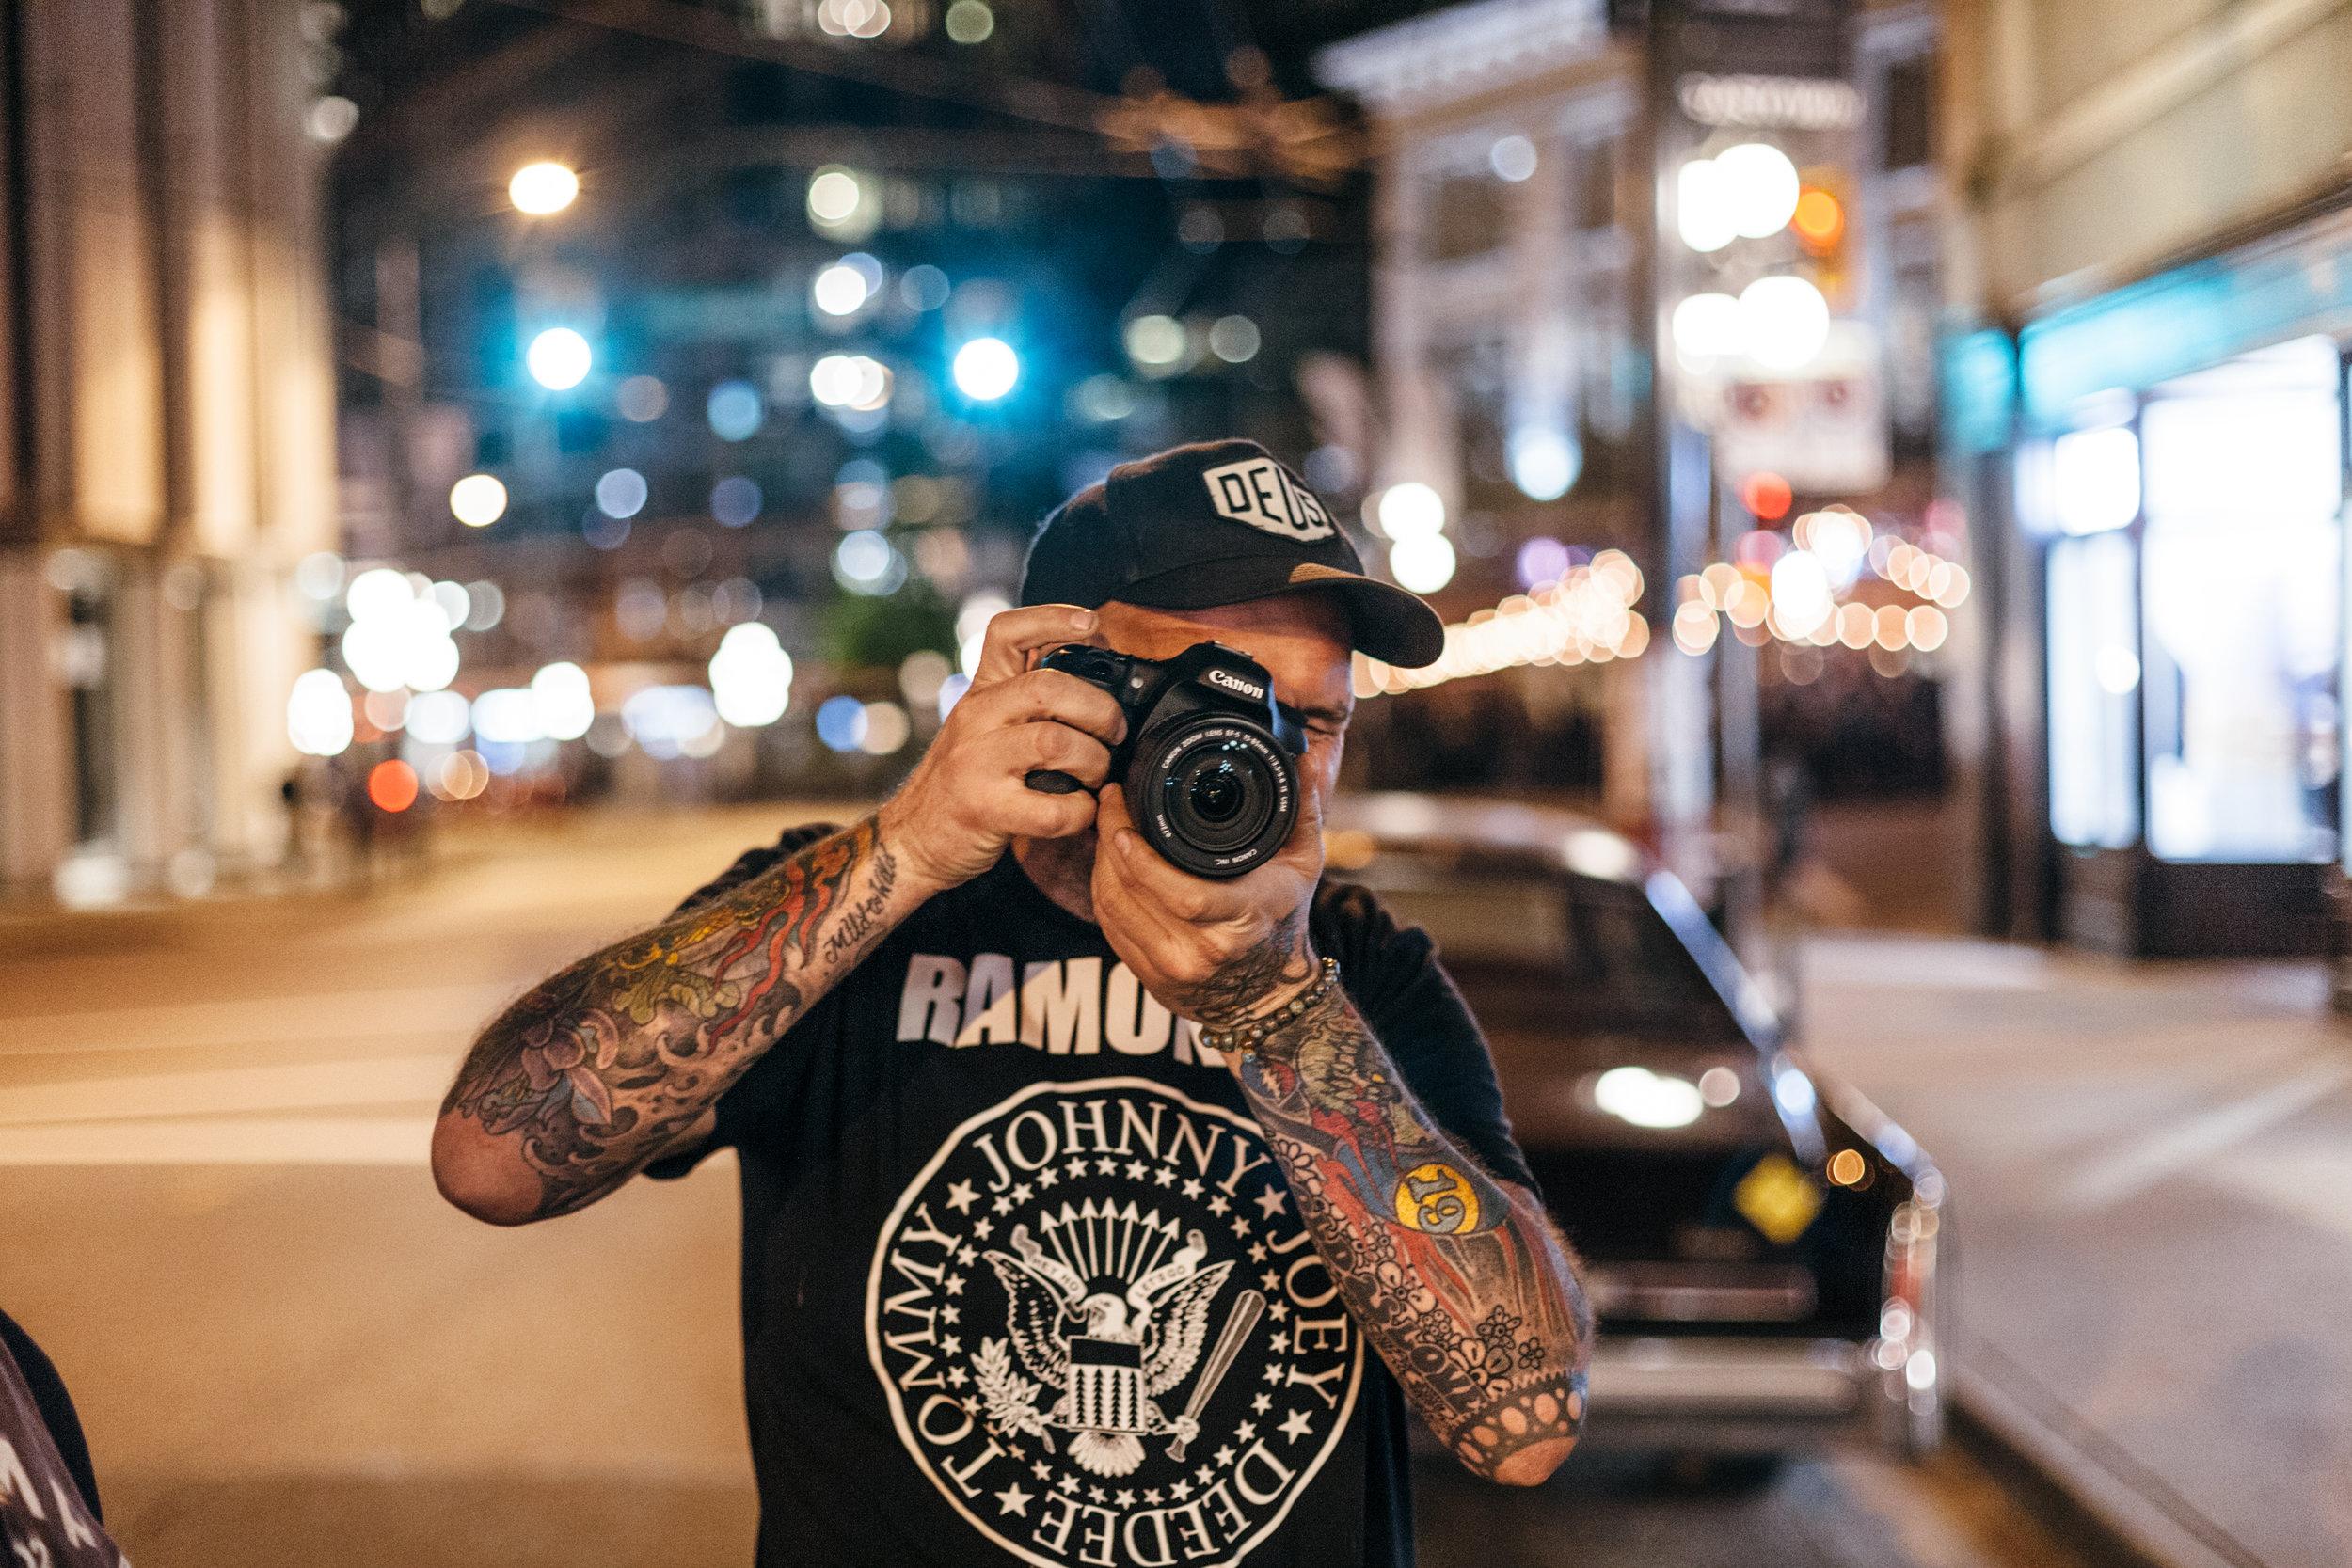 Viktor Radics_#TheMotoSocialVANCOUVER_May 9_2017_TimbertrainCoffeeRoastersIMG_6642_FULLRes.jpg